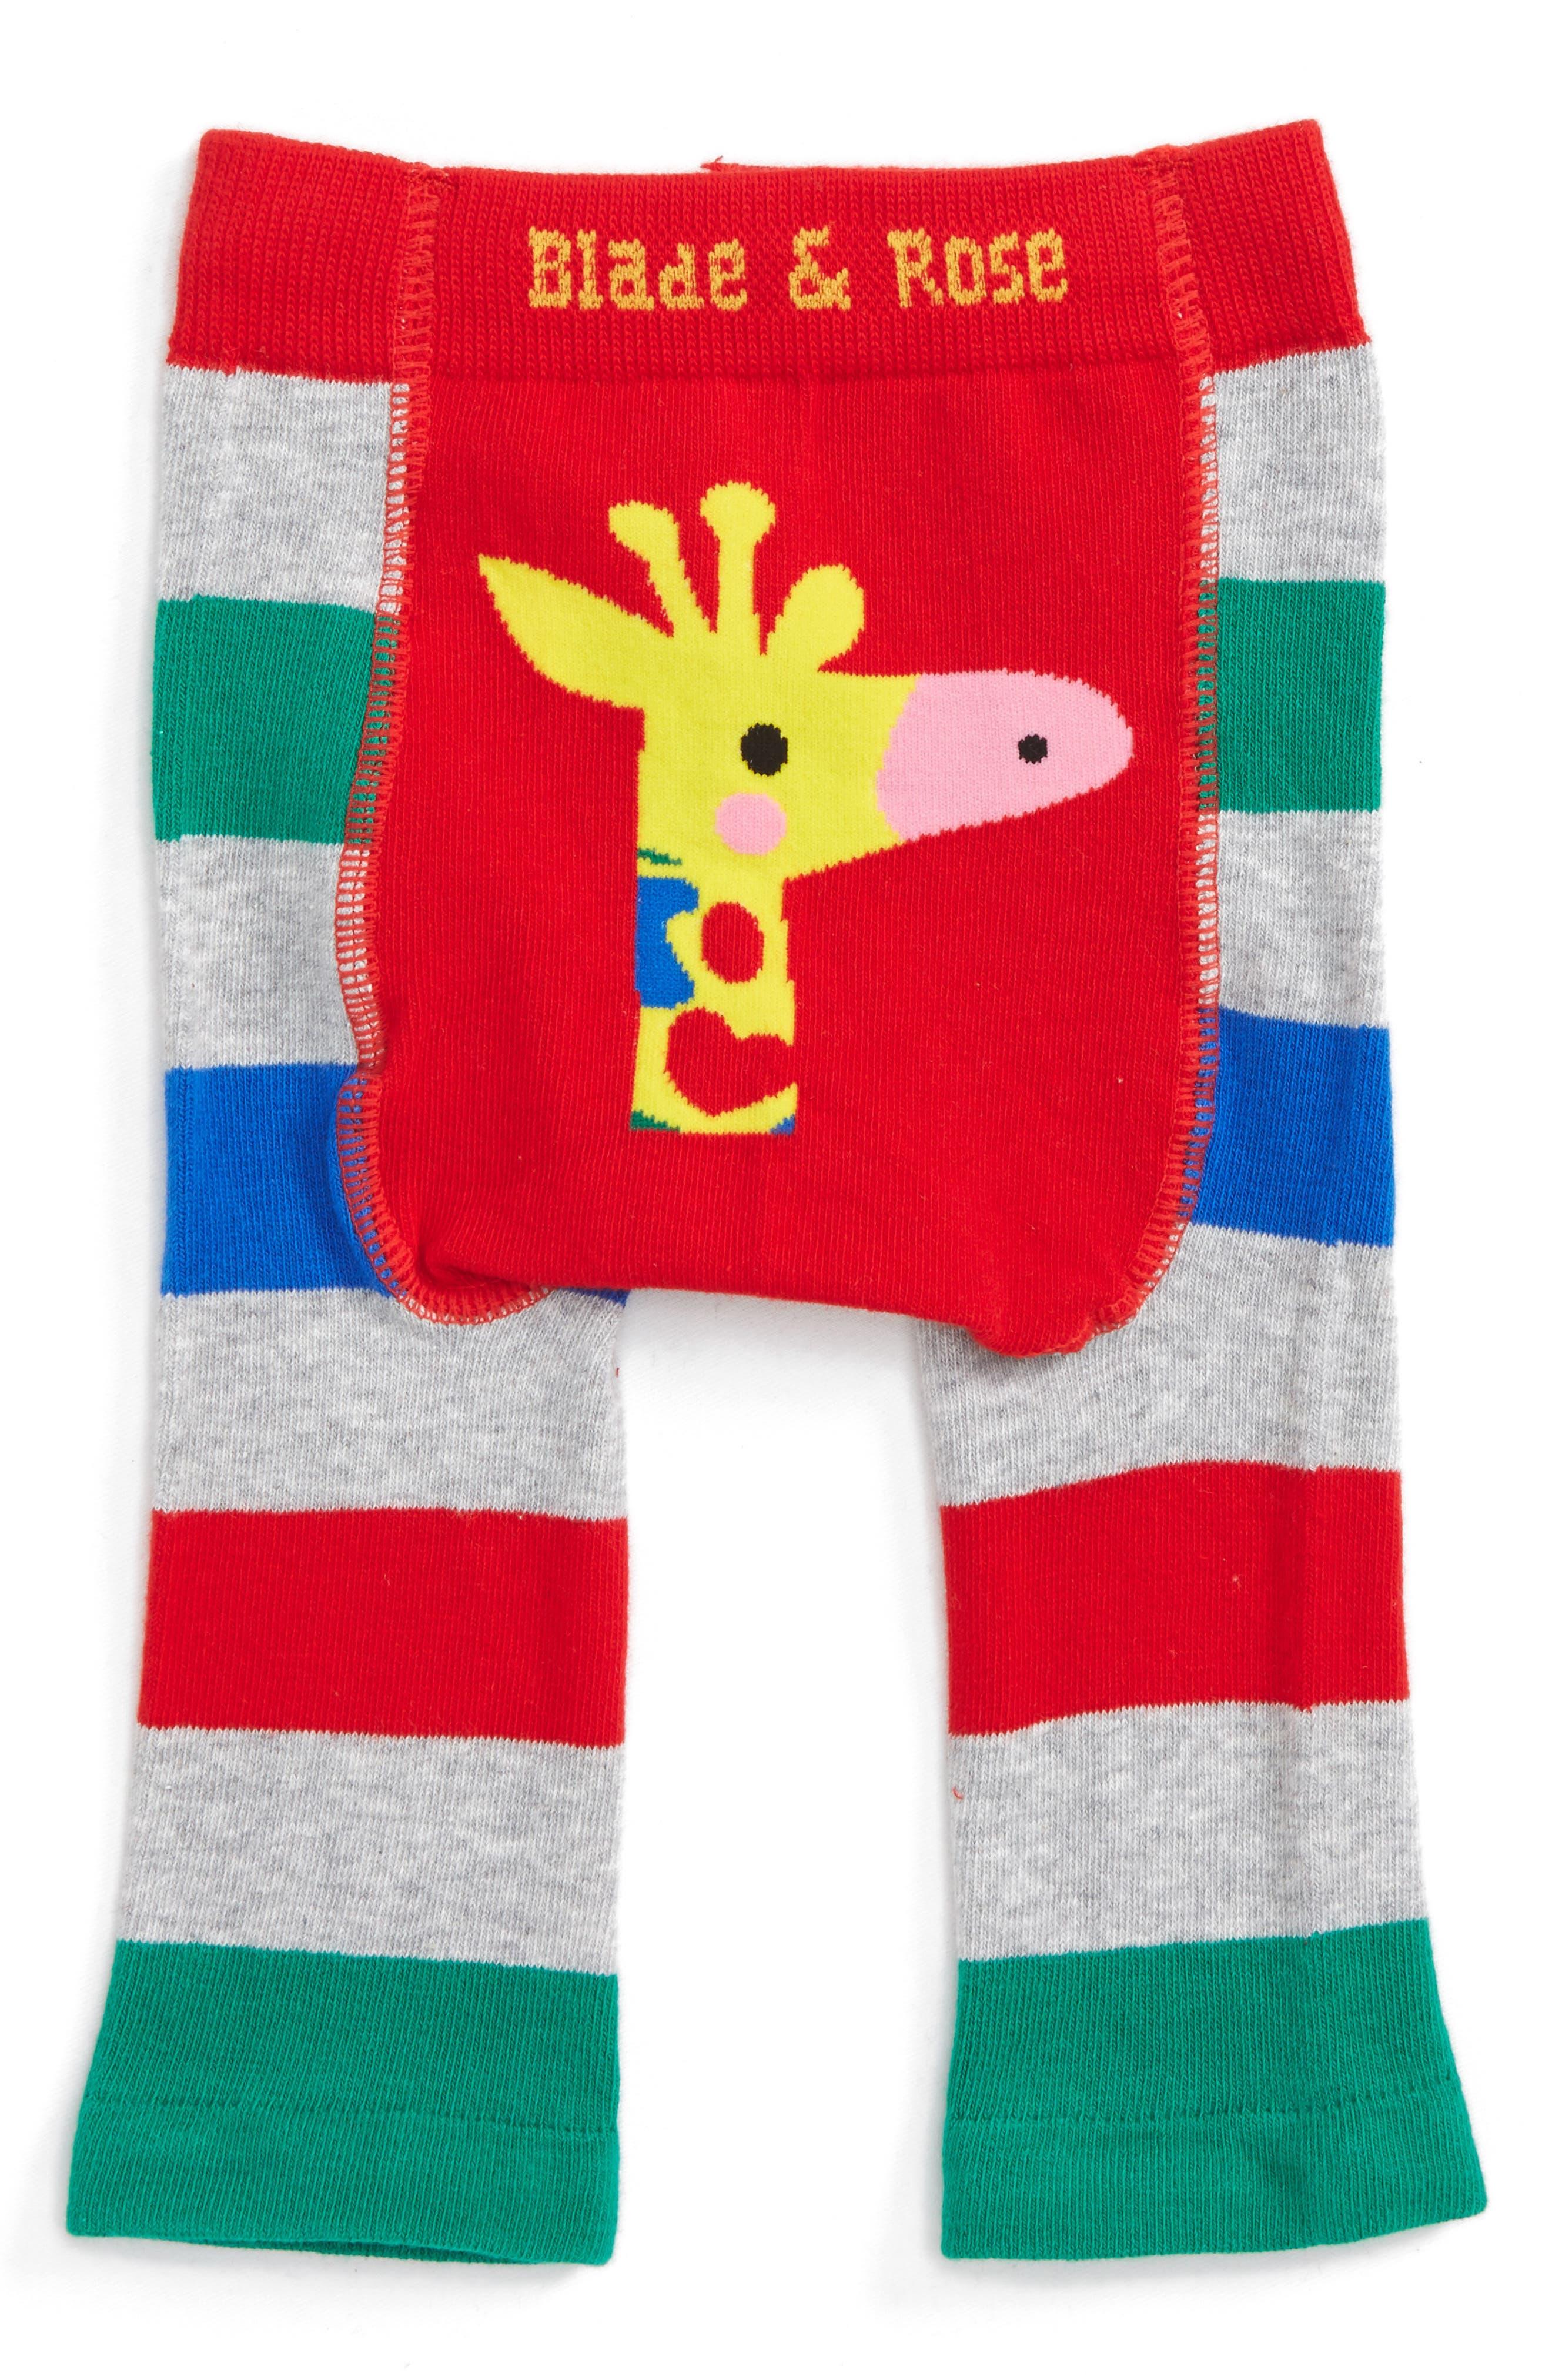 Giraffe Leggings,                             Main thumbnail 1, color,                             Green / Grey Marl / Blue / Red